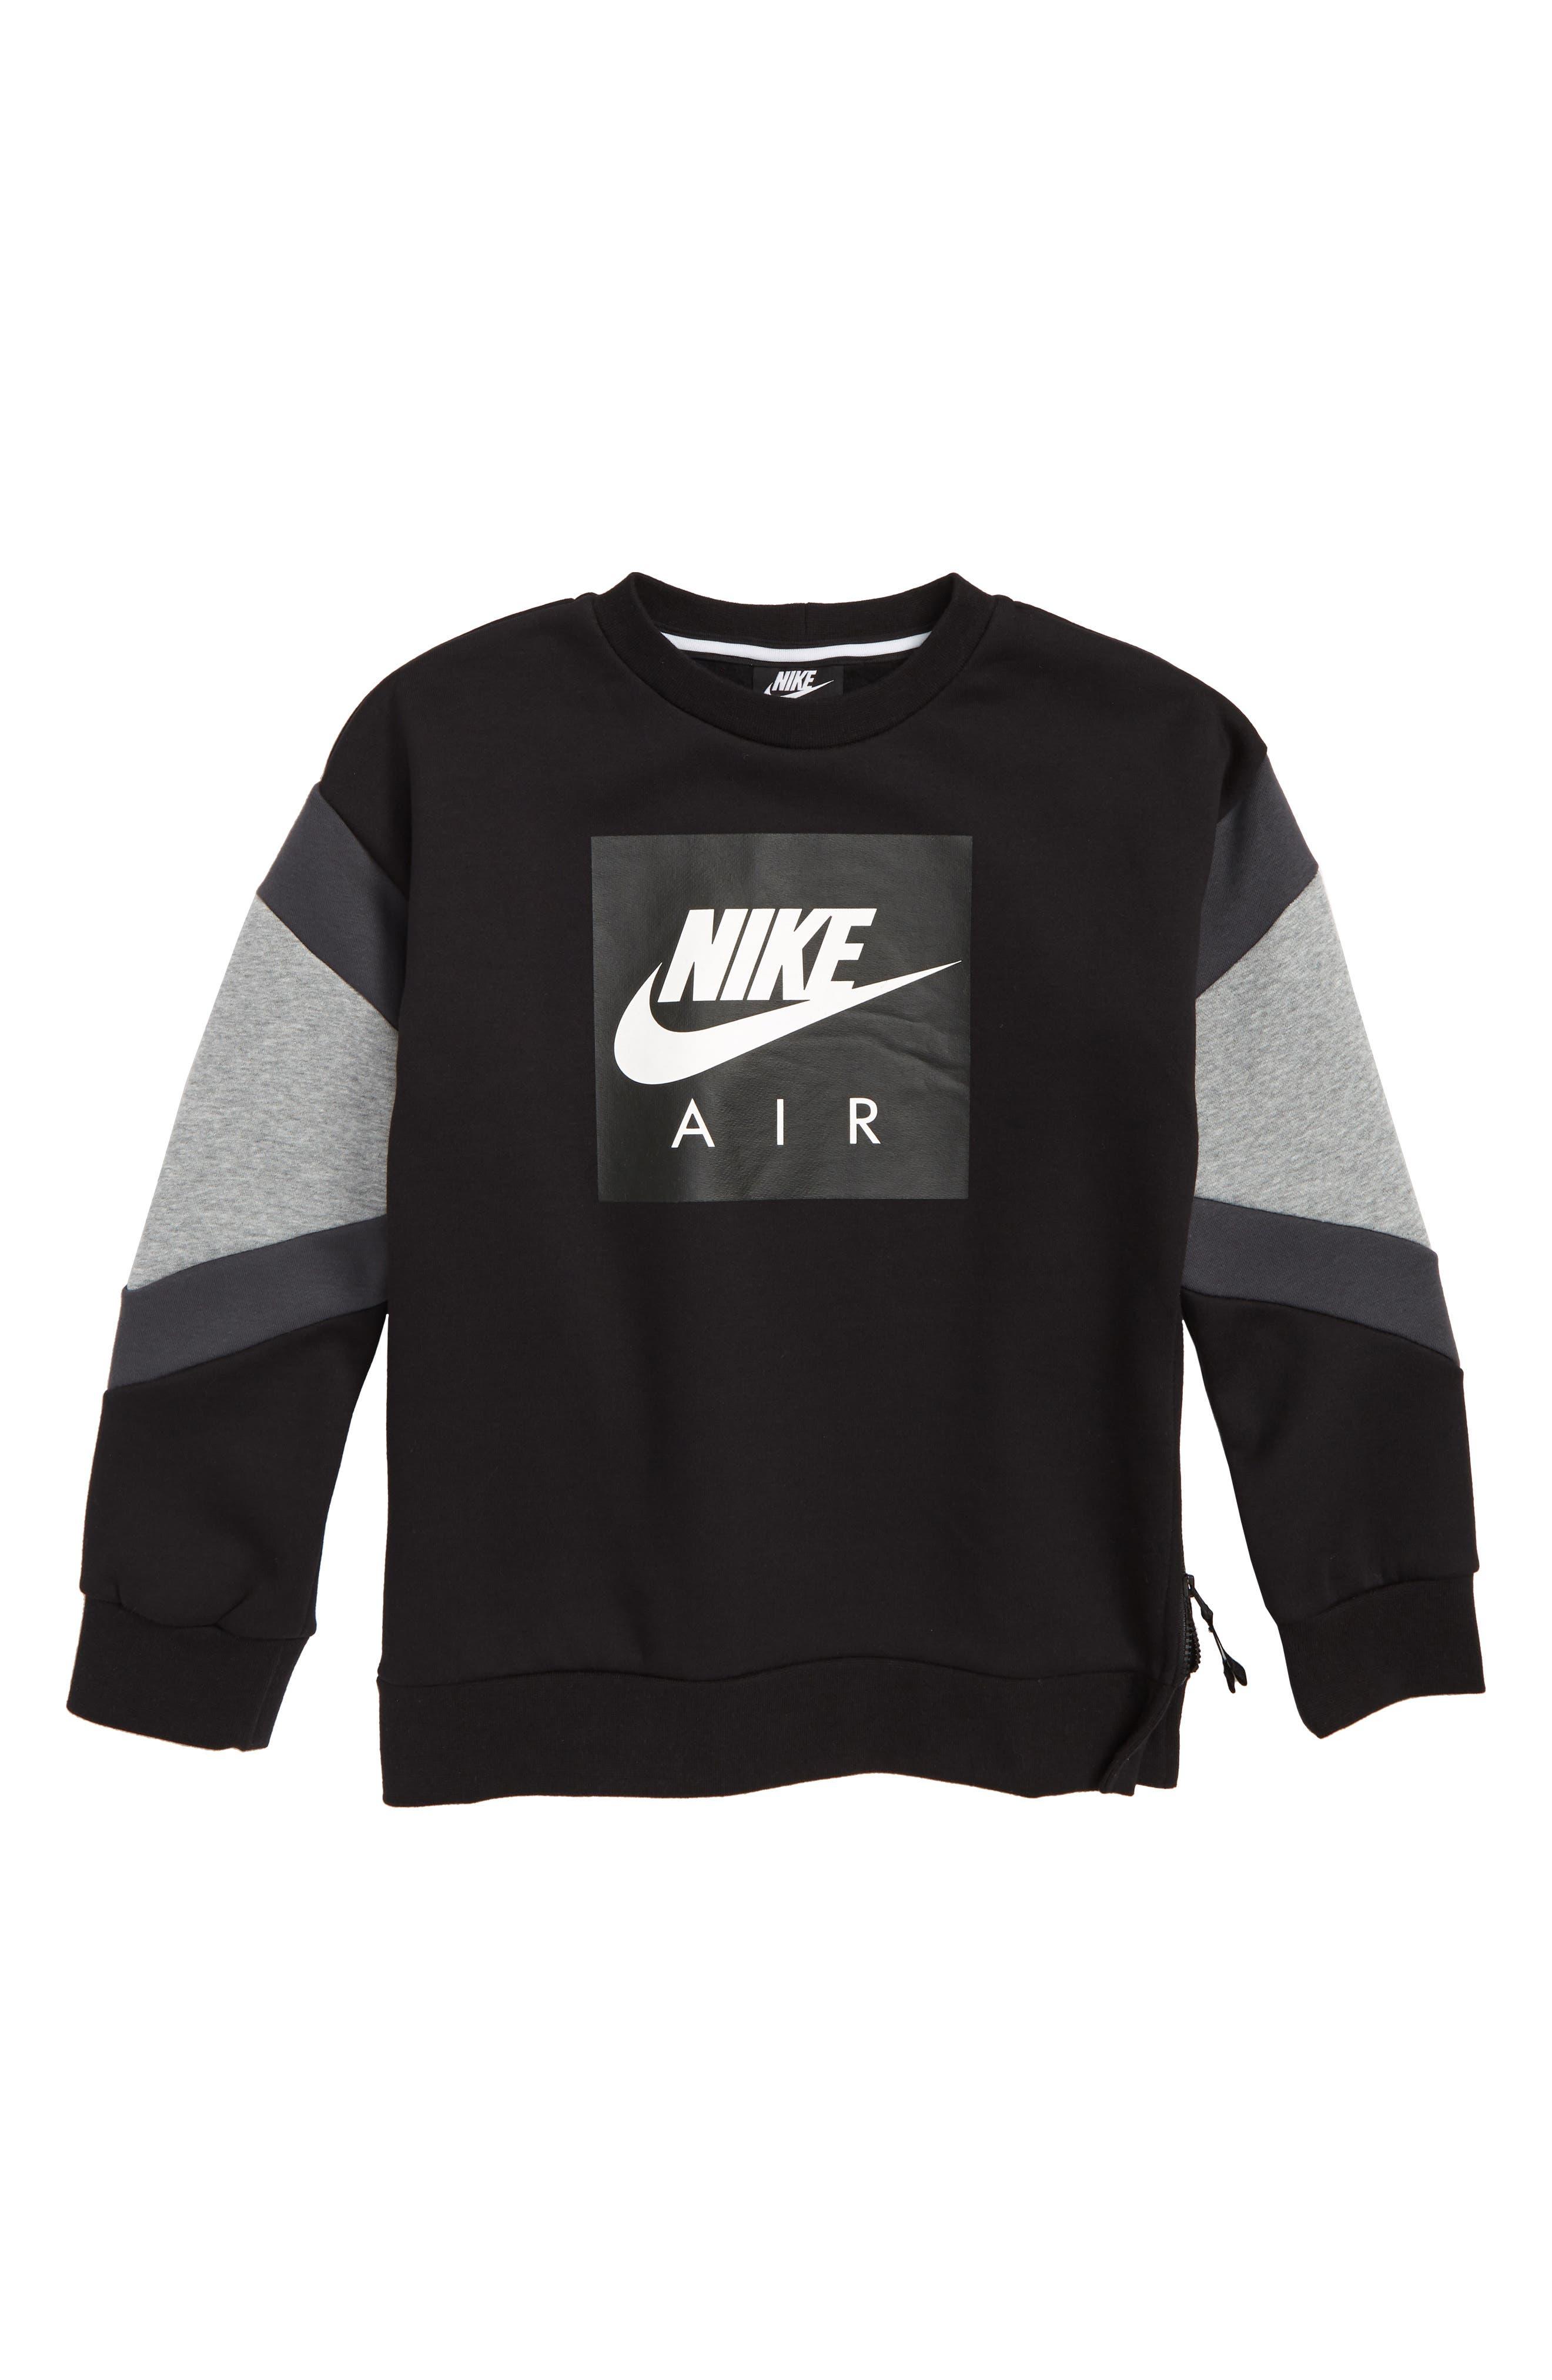 Boys Nike Air Sweatshirt